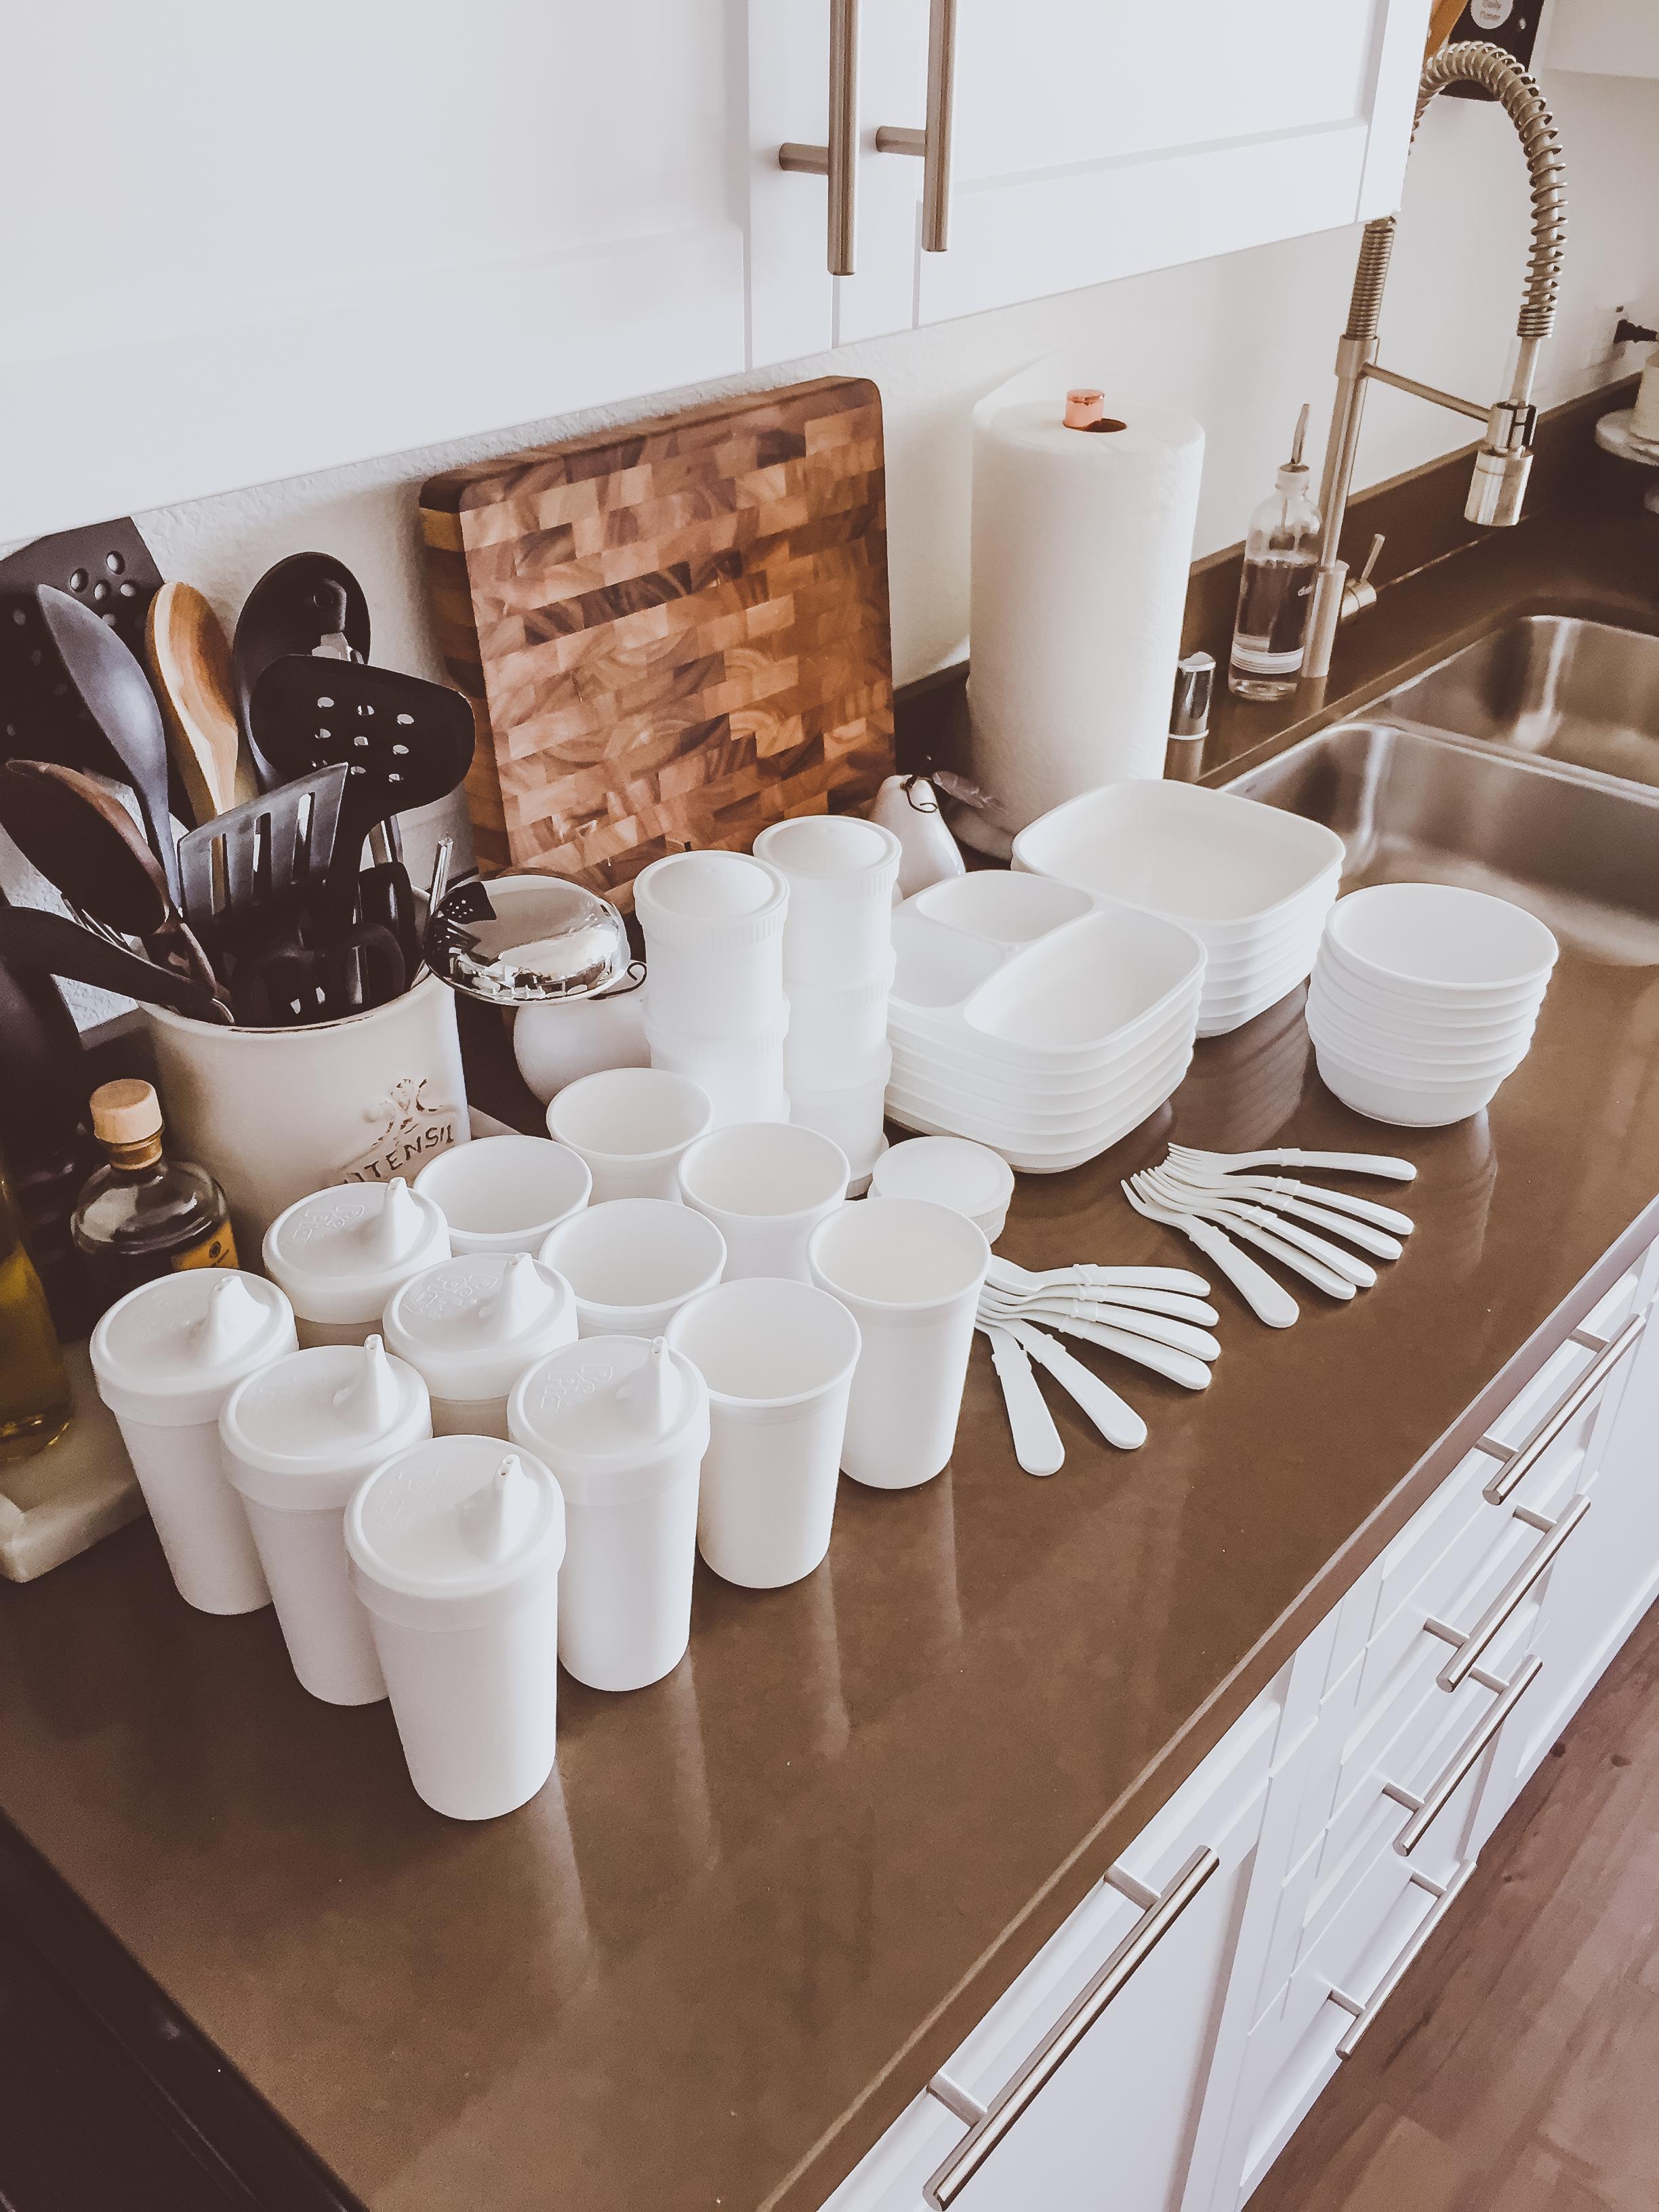 All-White Baby & Toddler Plastic Tableware | BondGirlGlam.com